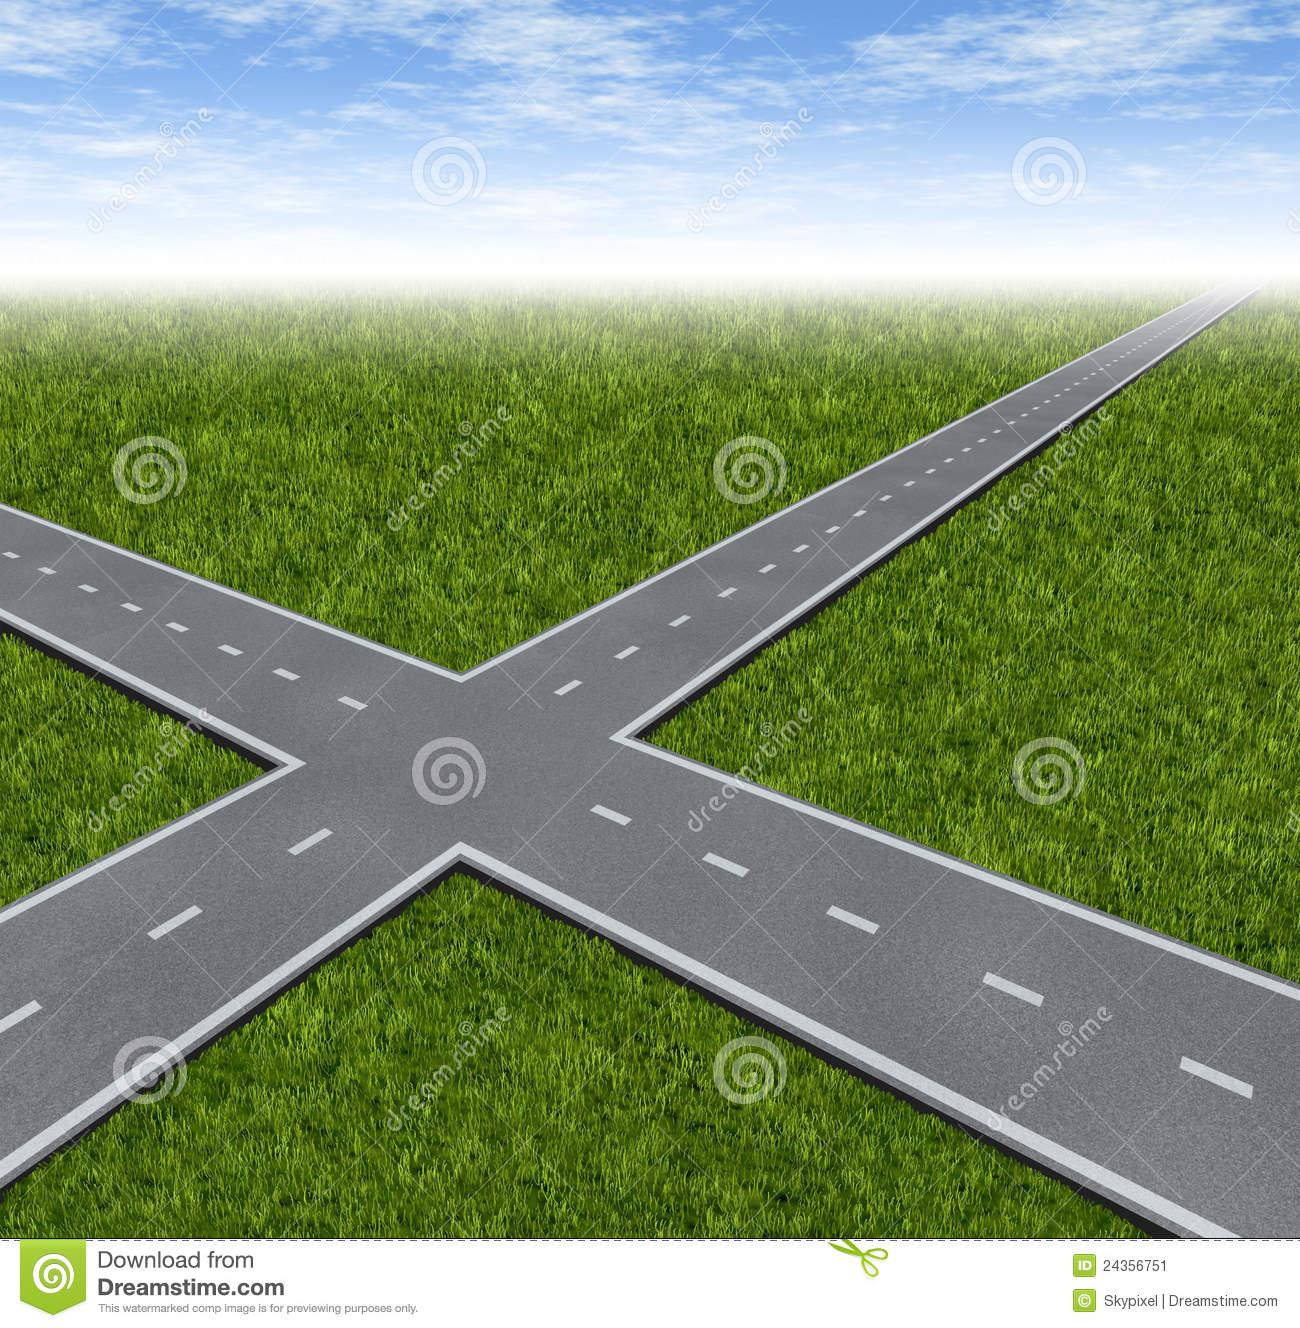 Cross Road Backgrounds, Compatible - PC, Mobile, Gadgets  1300x1328 px